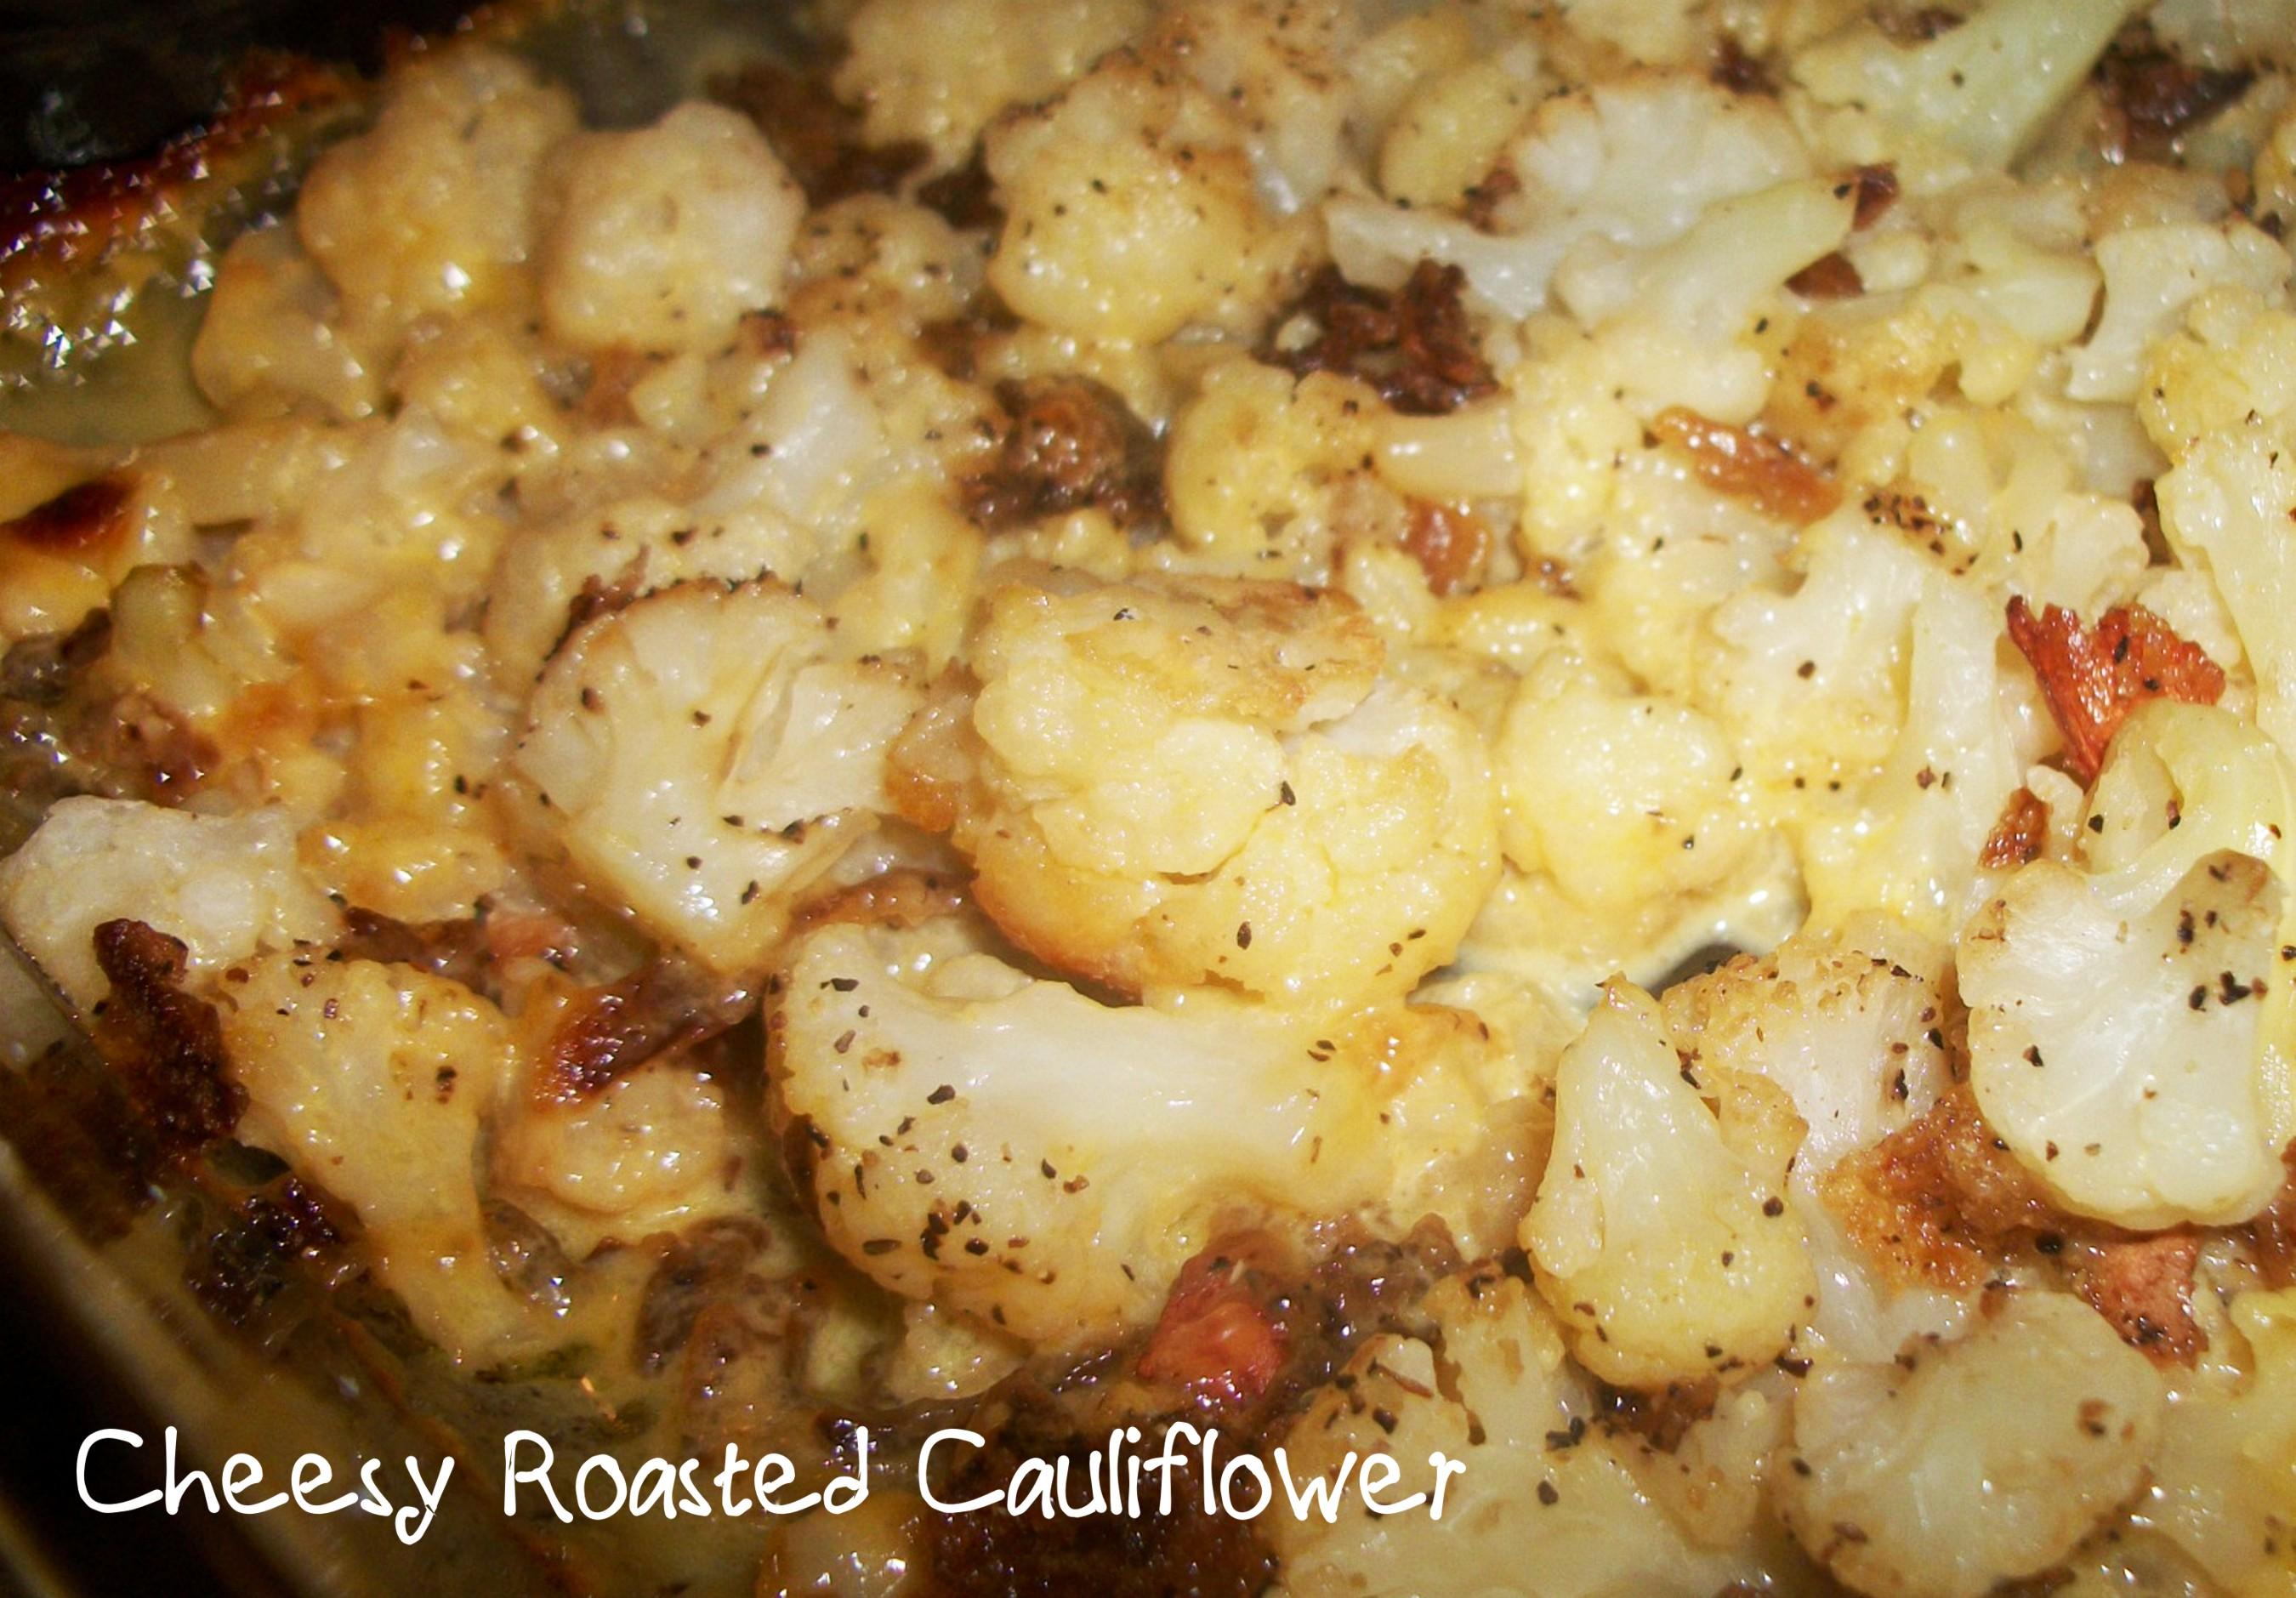 Roasted Cauliflower With Bacon And Garlic Recipes — Dishmaps